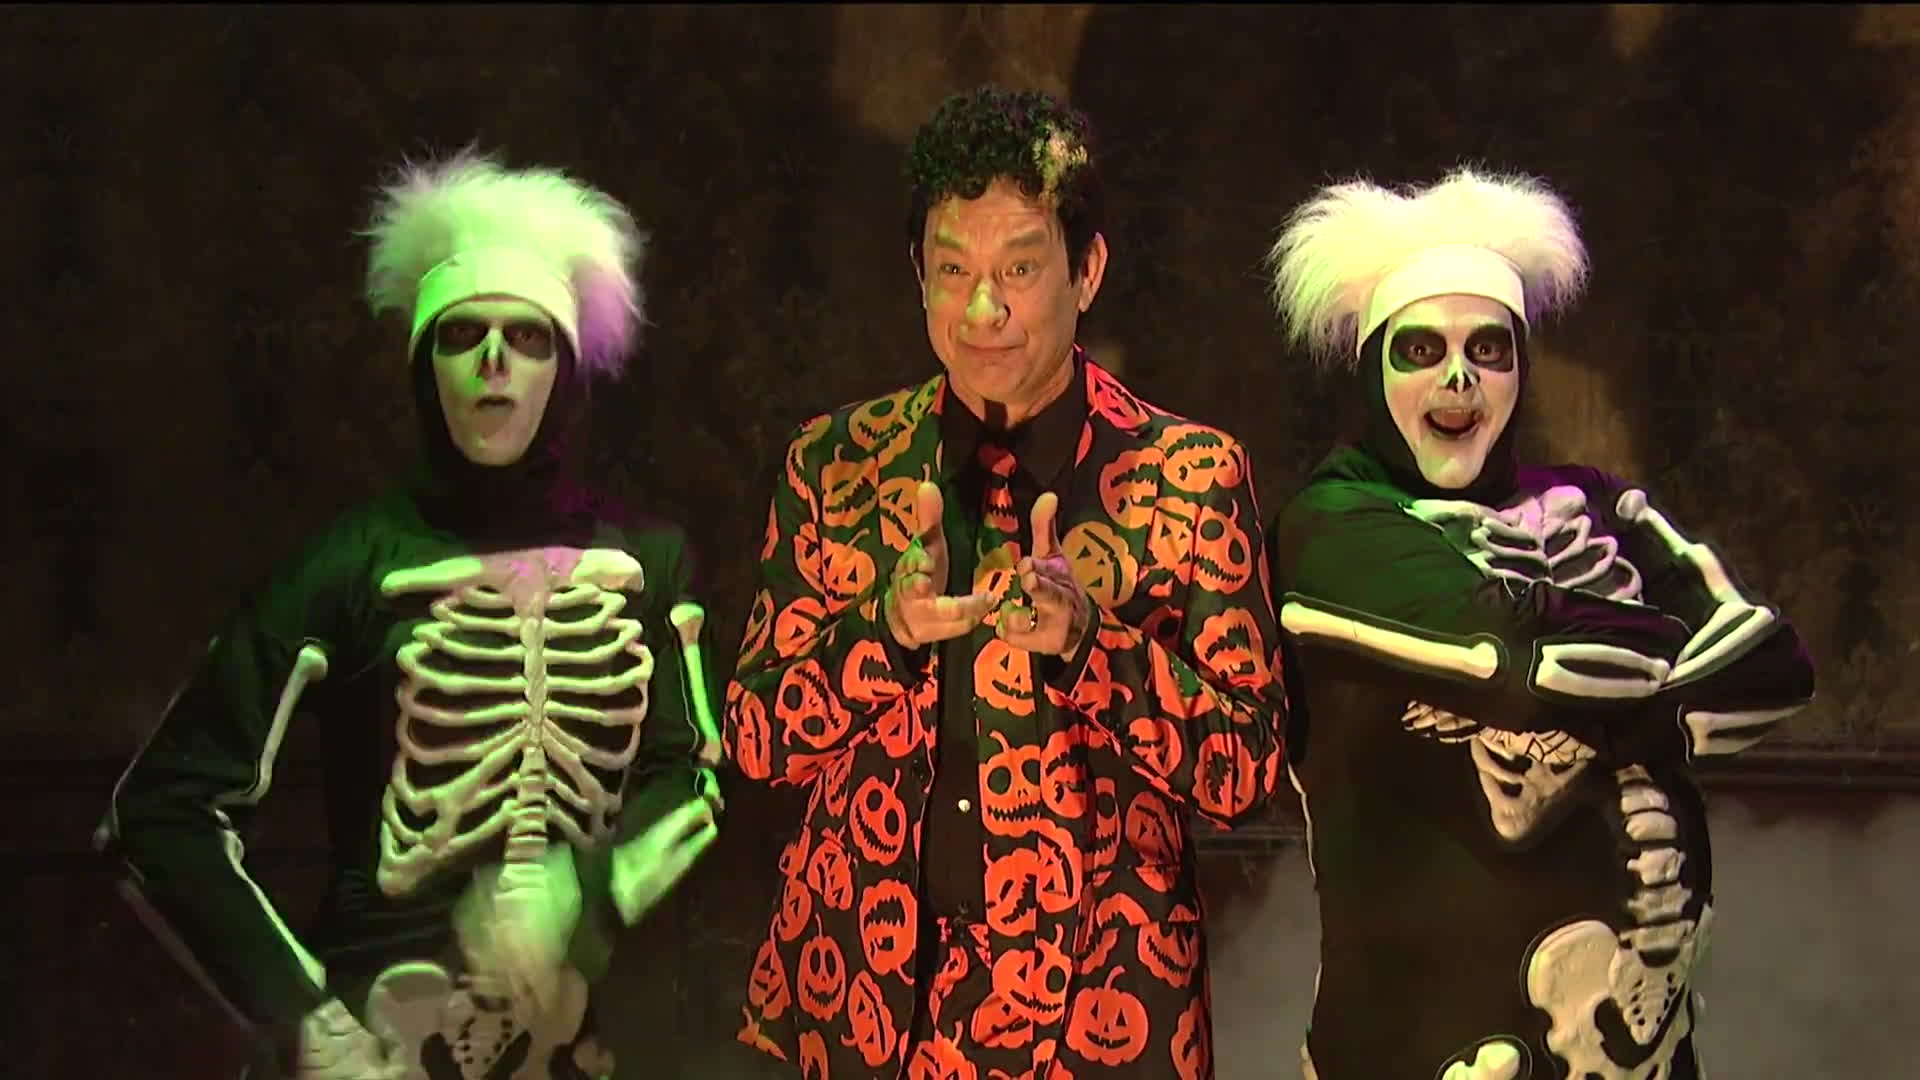 david pumpkins, david s pumpkins, halloween, saturday night live, season 42, snl, tom hanks, David Pumpkins - Haunted Elevator - SNL GIFs